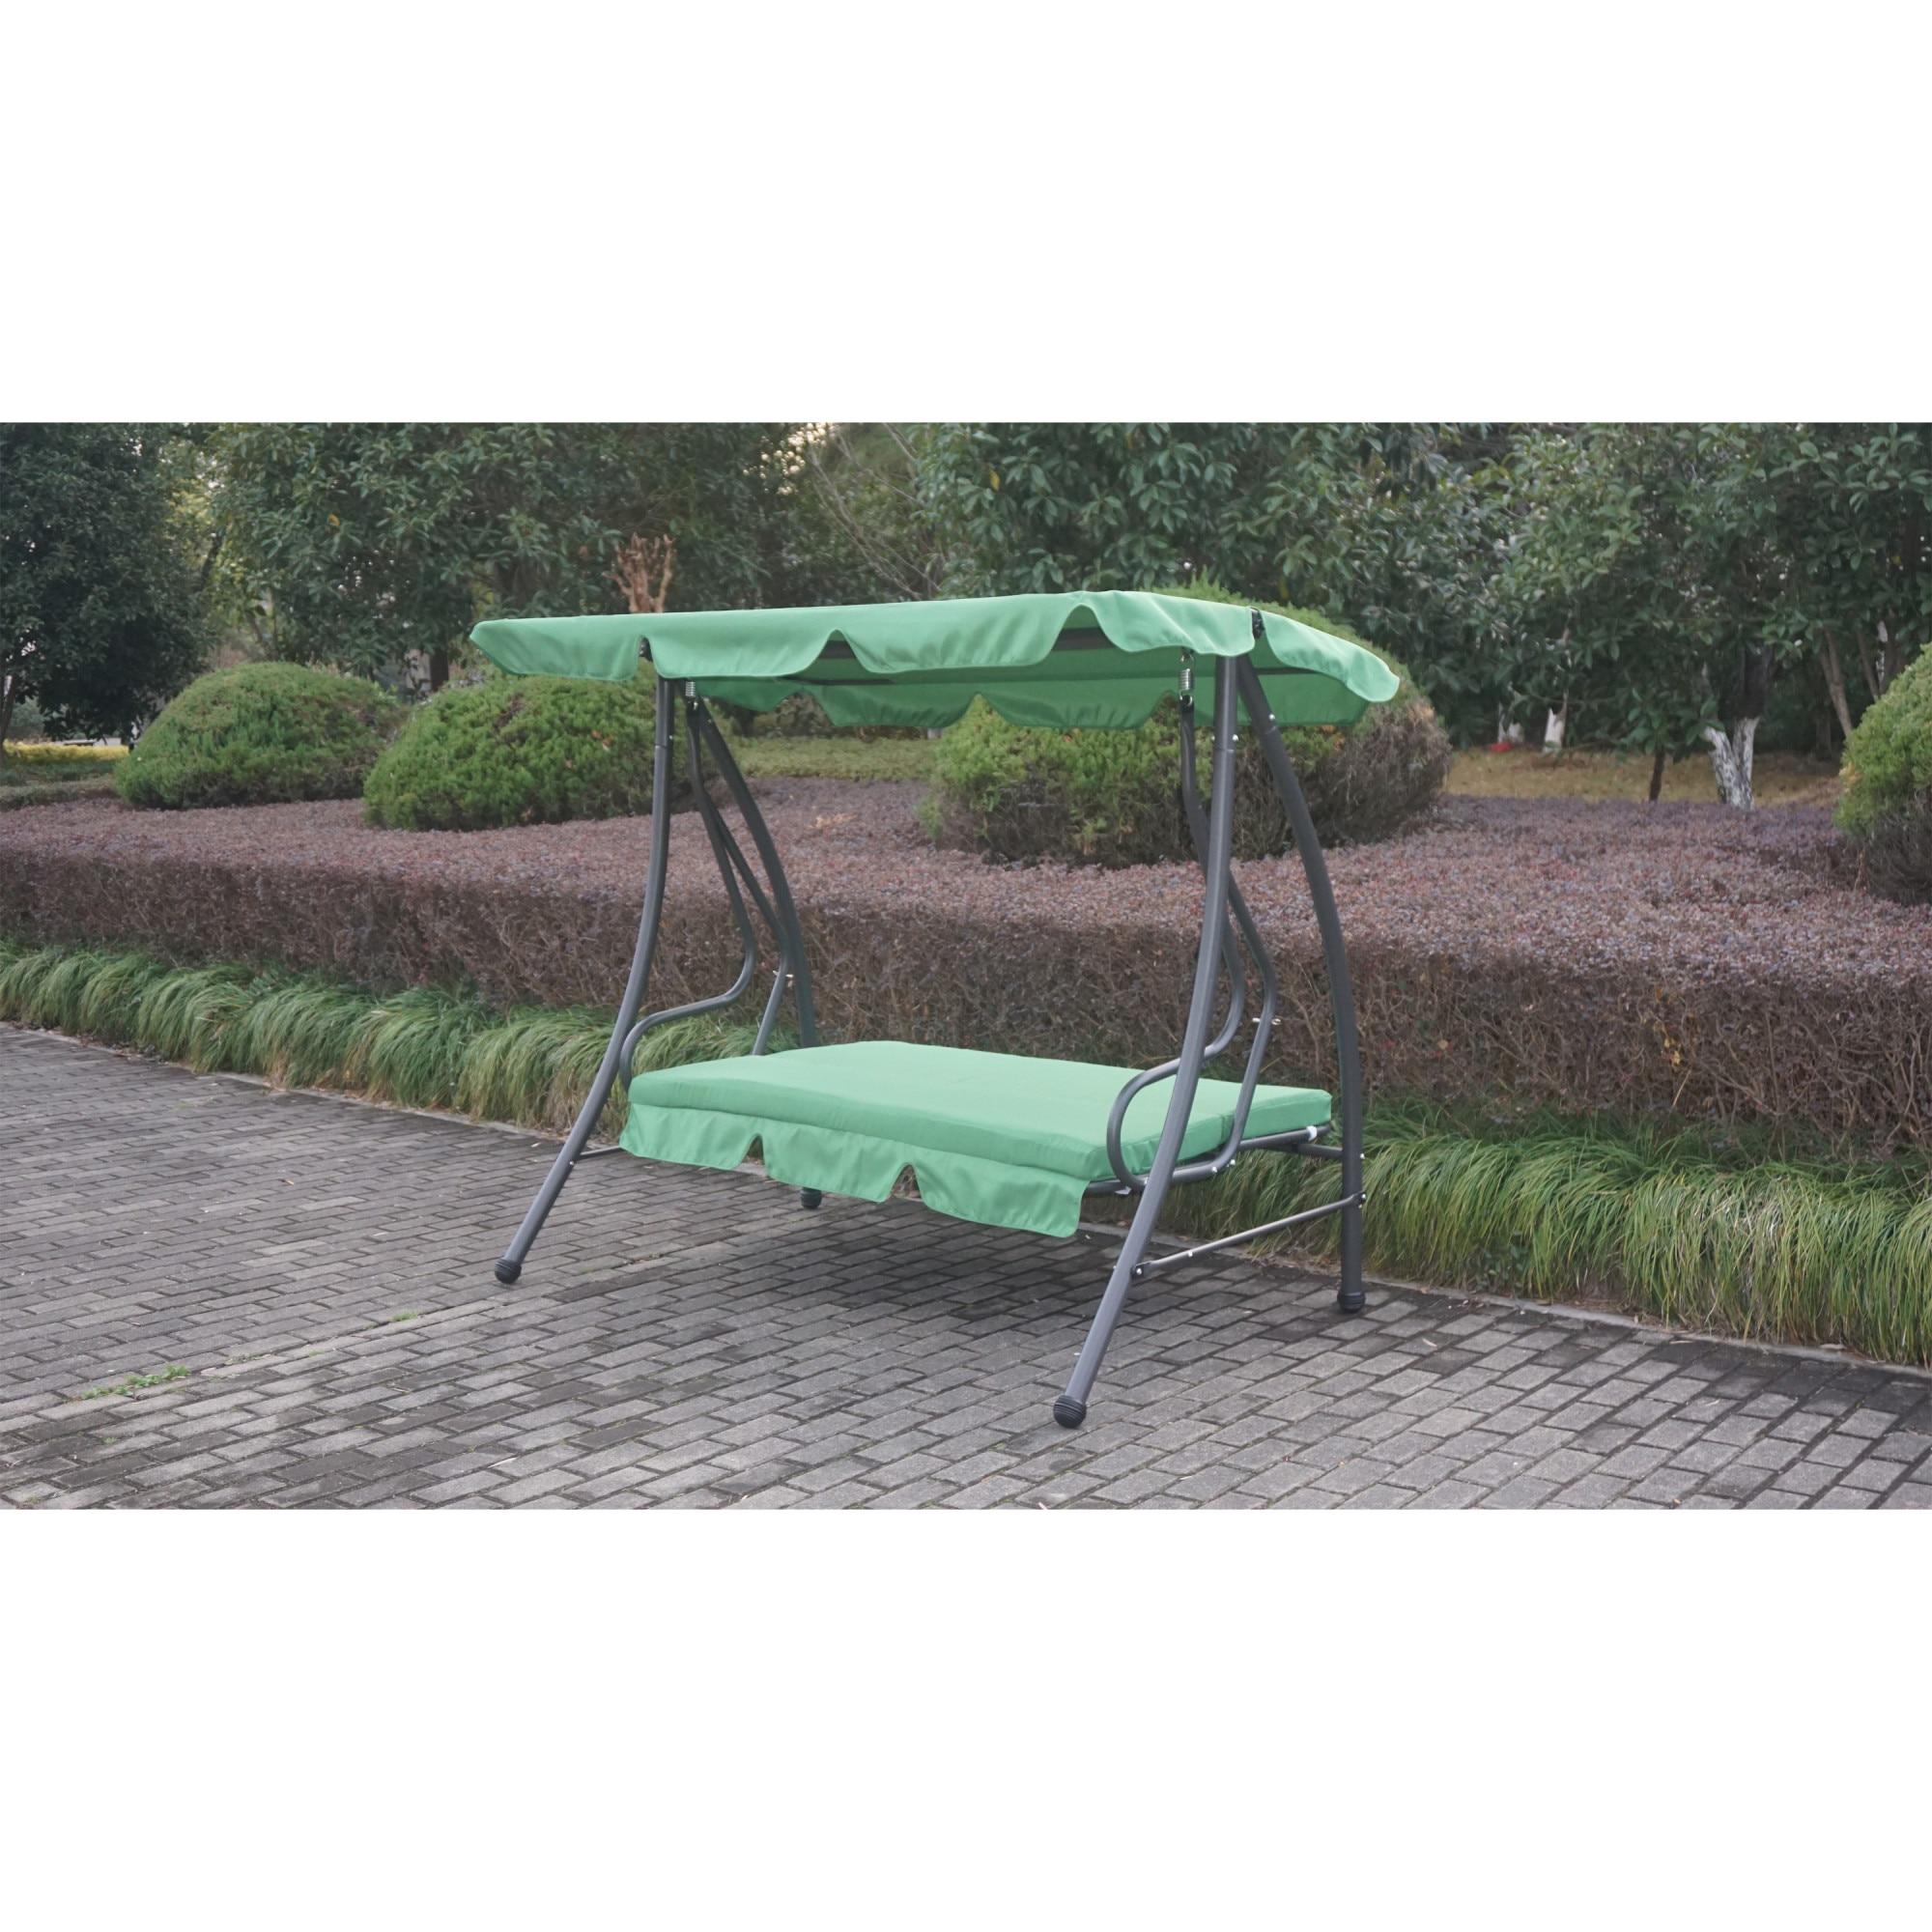 Fotografie Leagan/balansoar cu spatar rabatabil pentru gradina/terasa, Kring Sorrento, 195x120x164cm, Verde